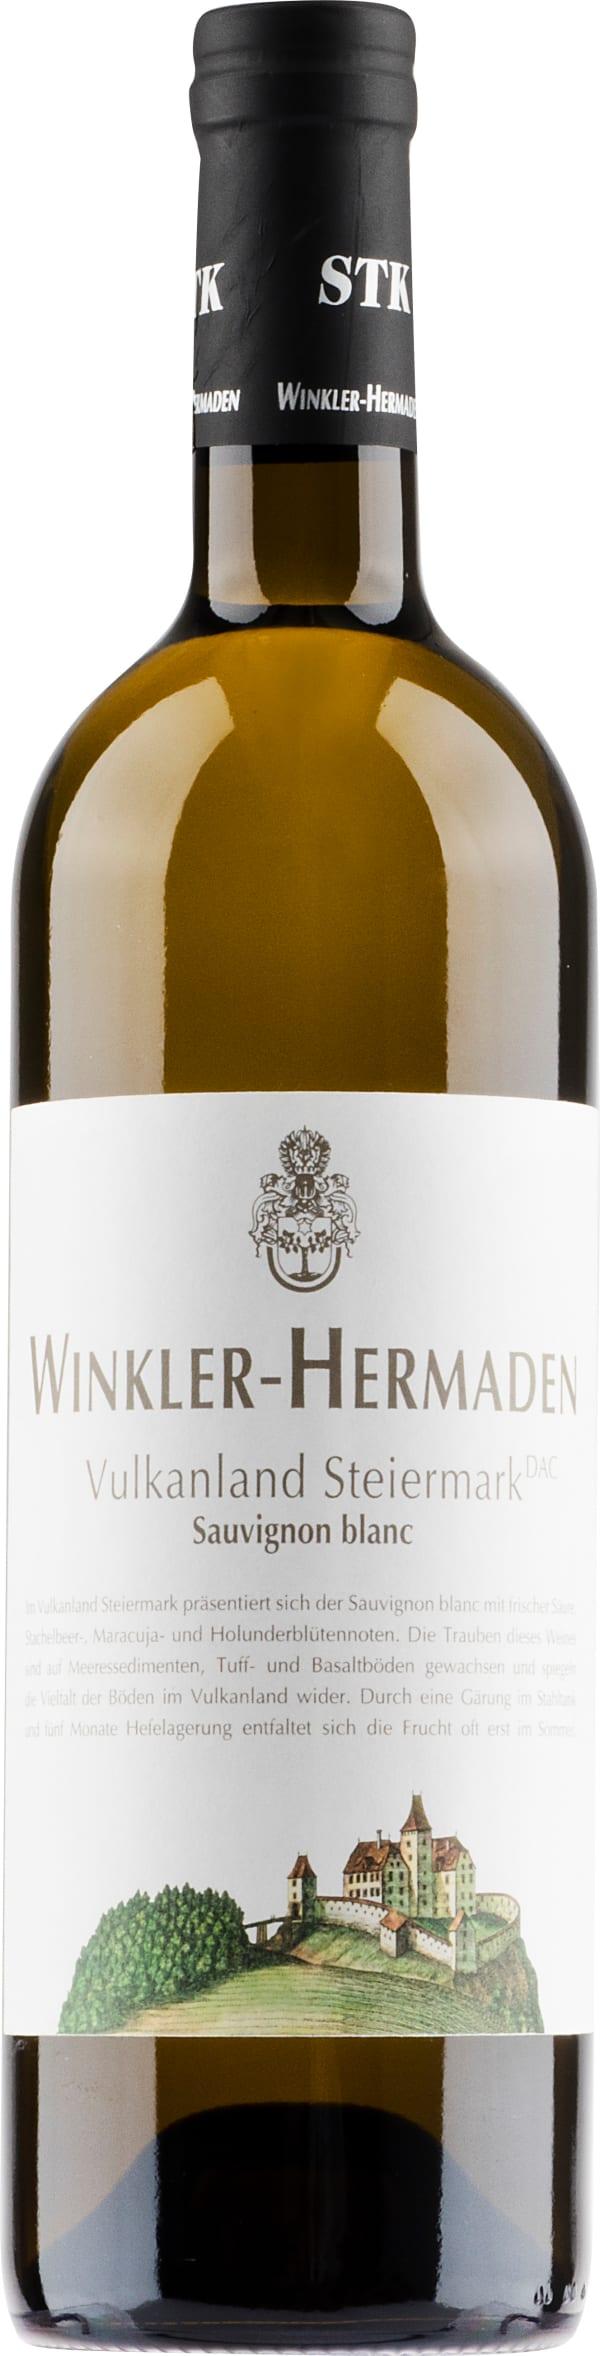 Winkler-Hermaden Sauvignon Blanc  2019